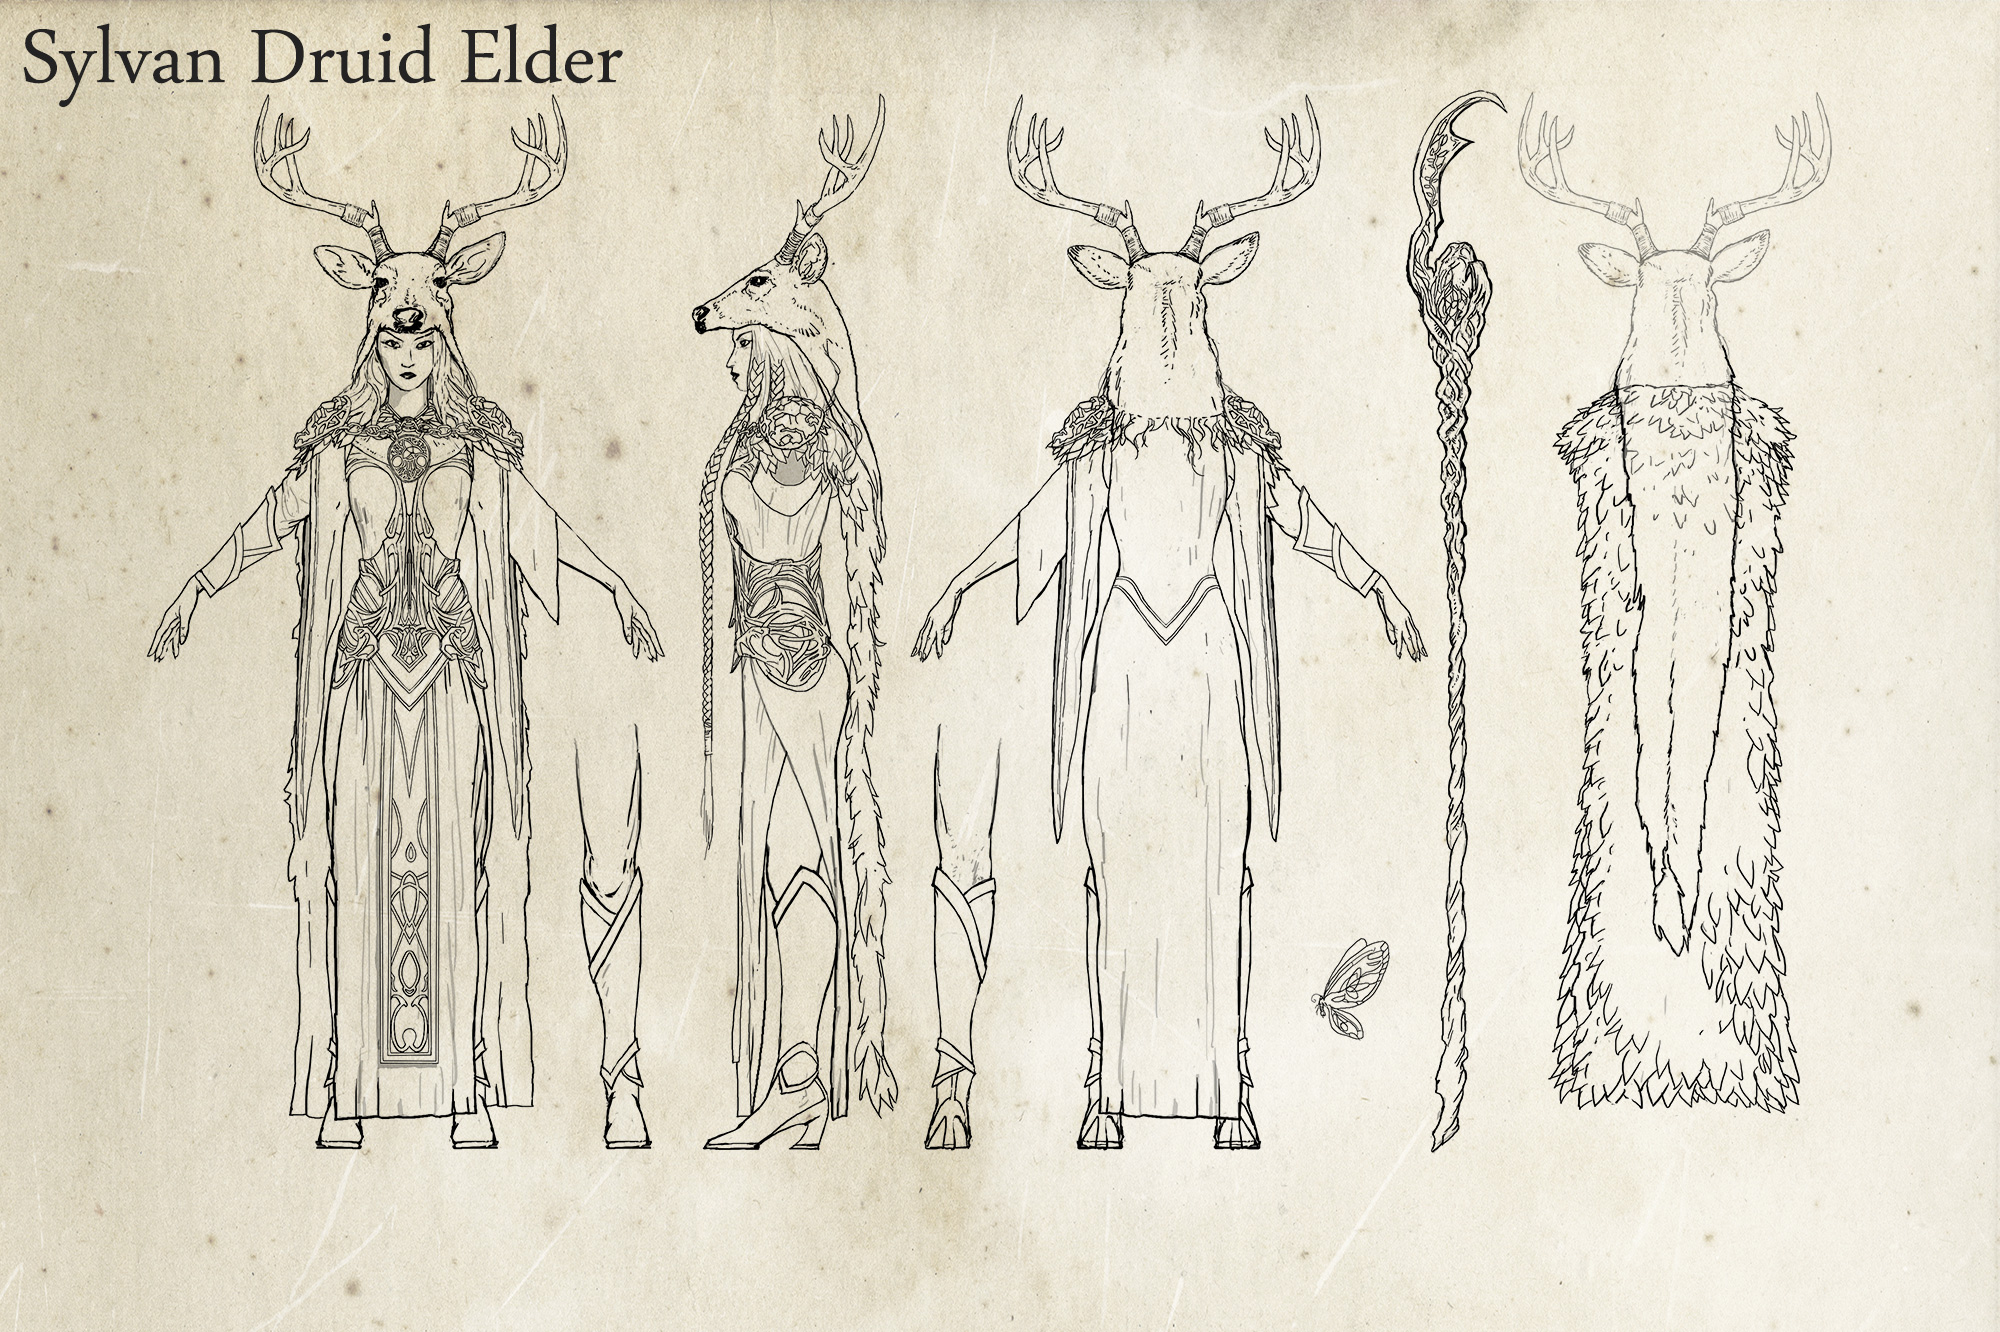 https://ubistatic-a.akamaihd.net/0004/prod/images/150624_Sylvan_2/MMH7_Druid_Elder_T.jpg